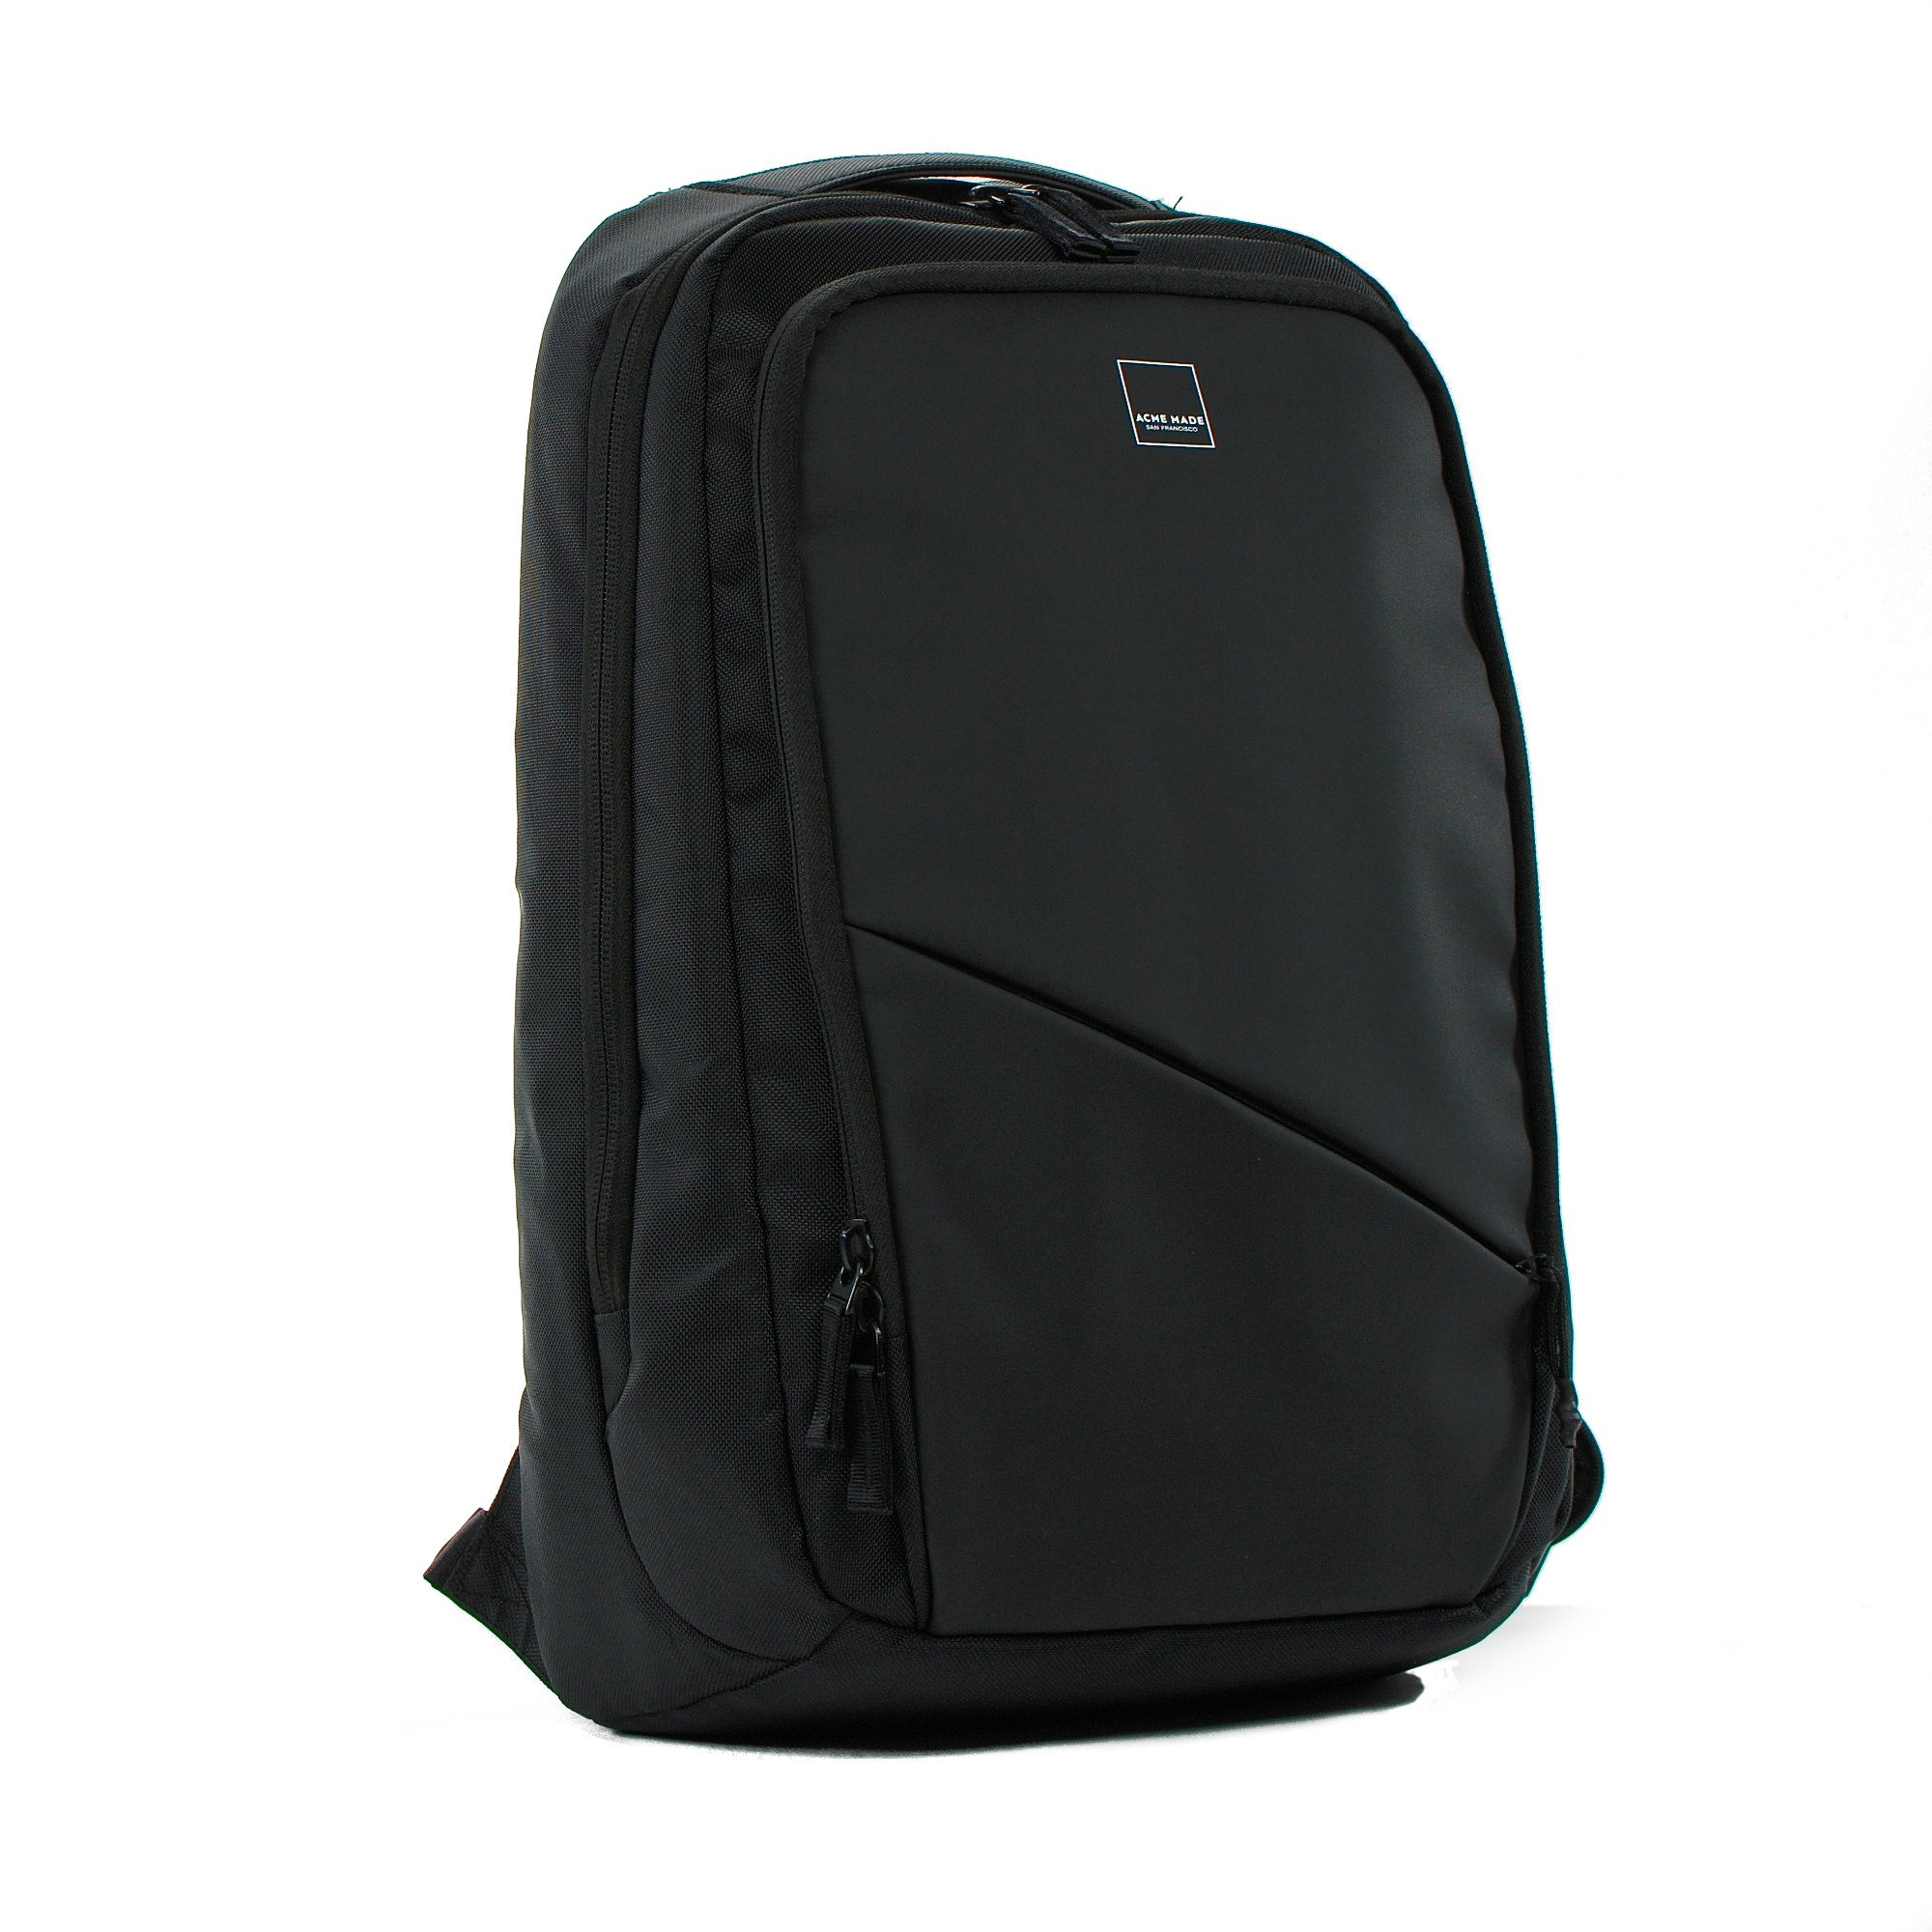 Acme Made - Union Street Commuter Backpack (Matte Black) (AM20311)